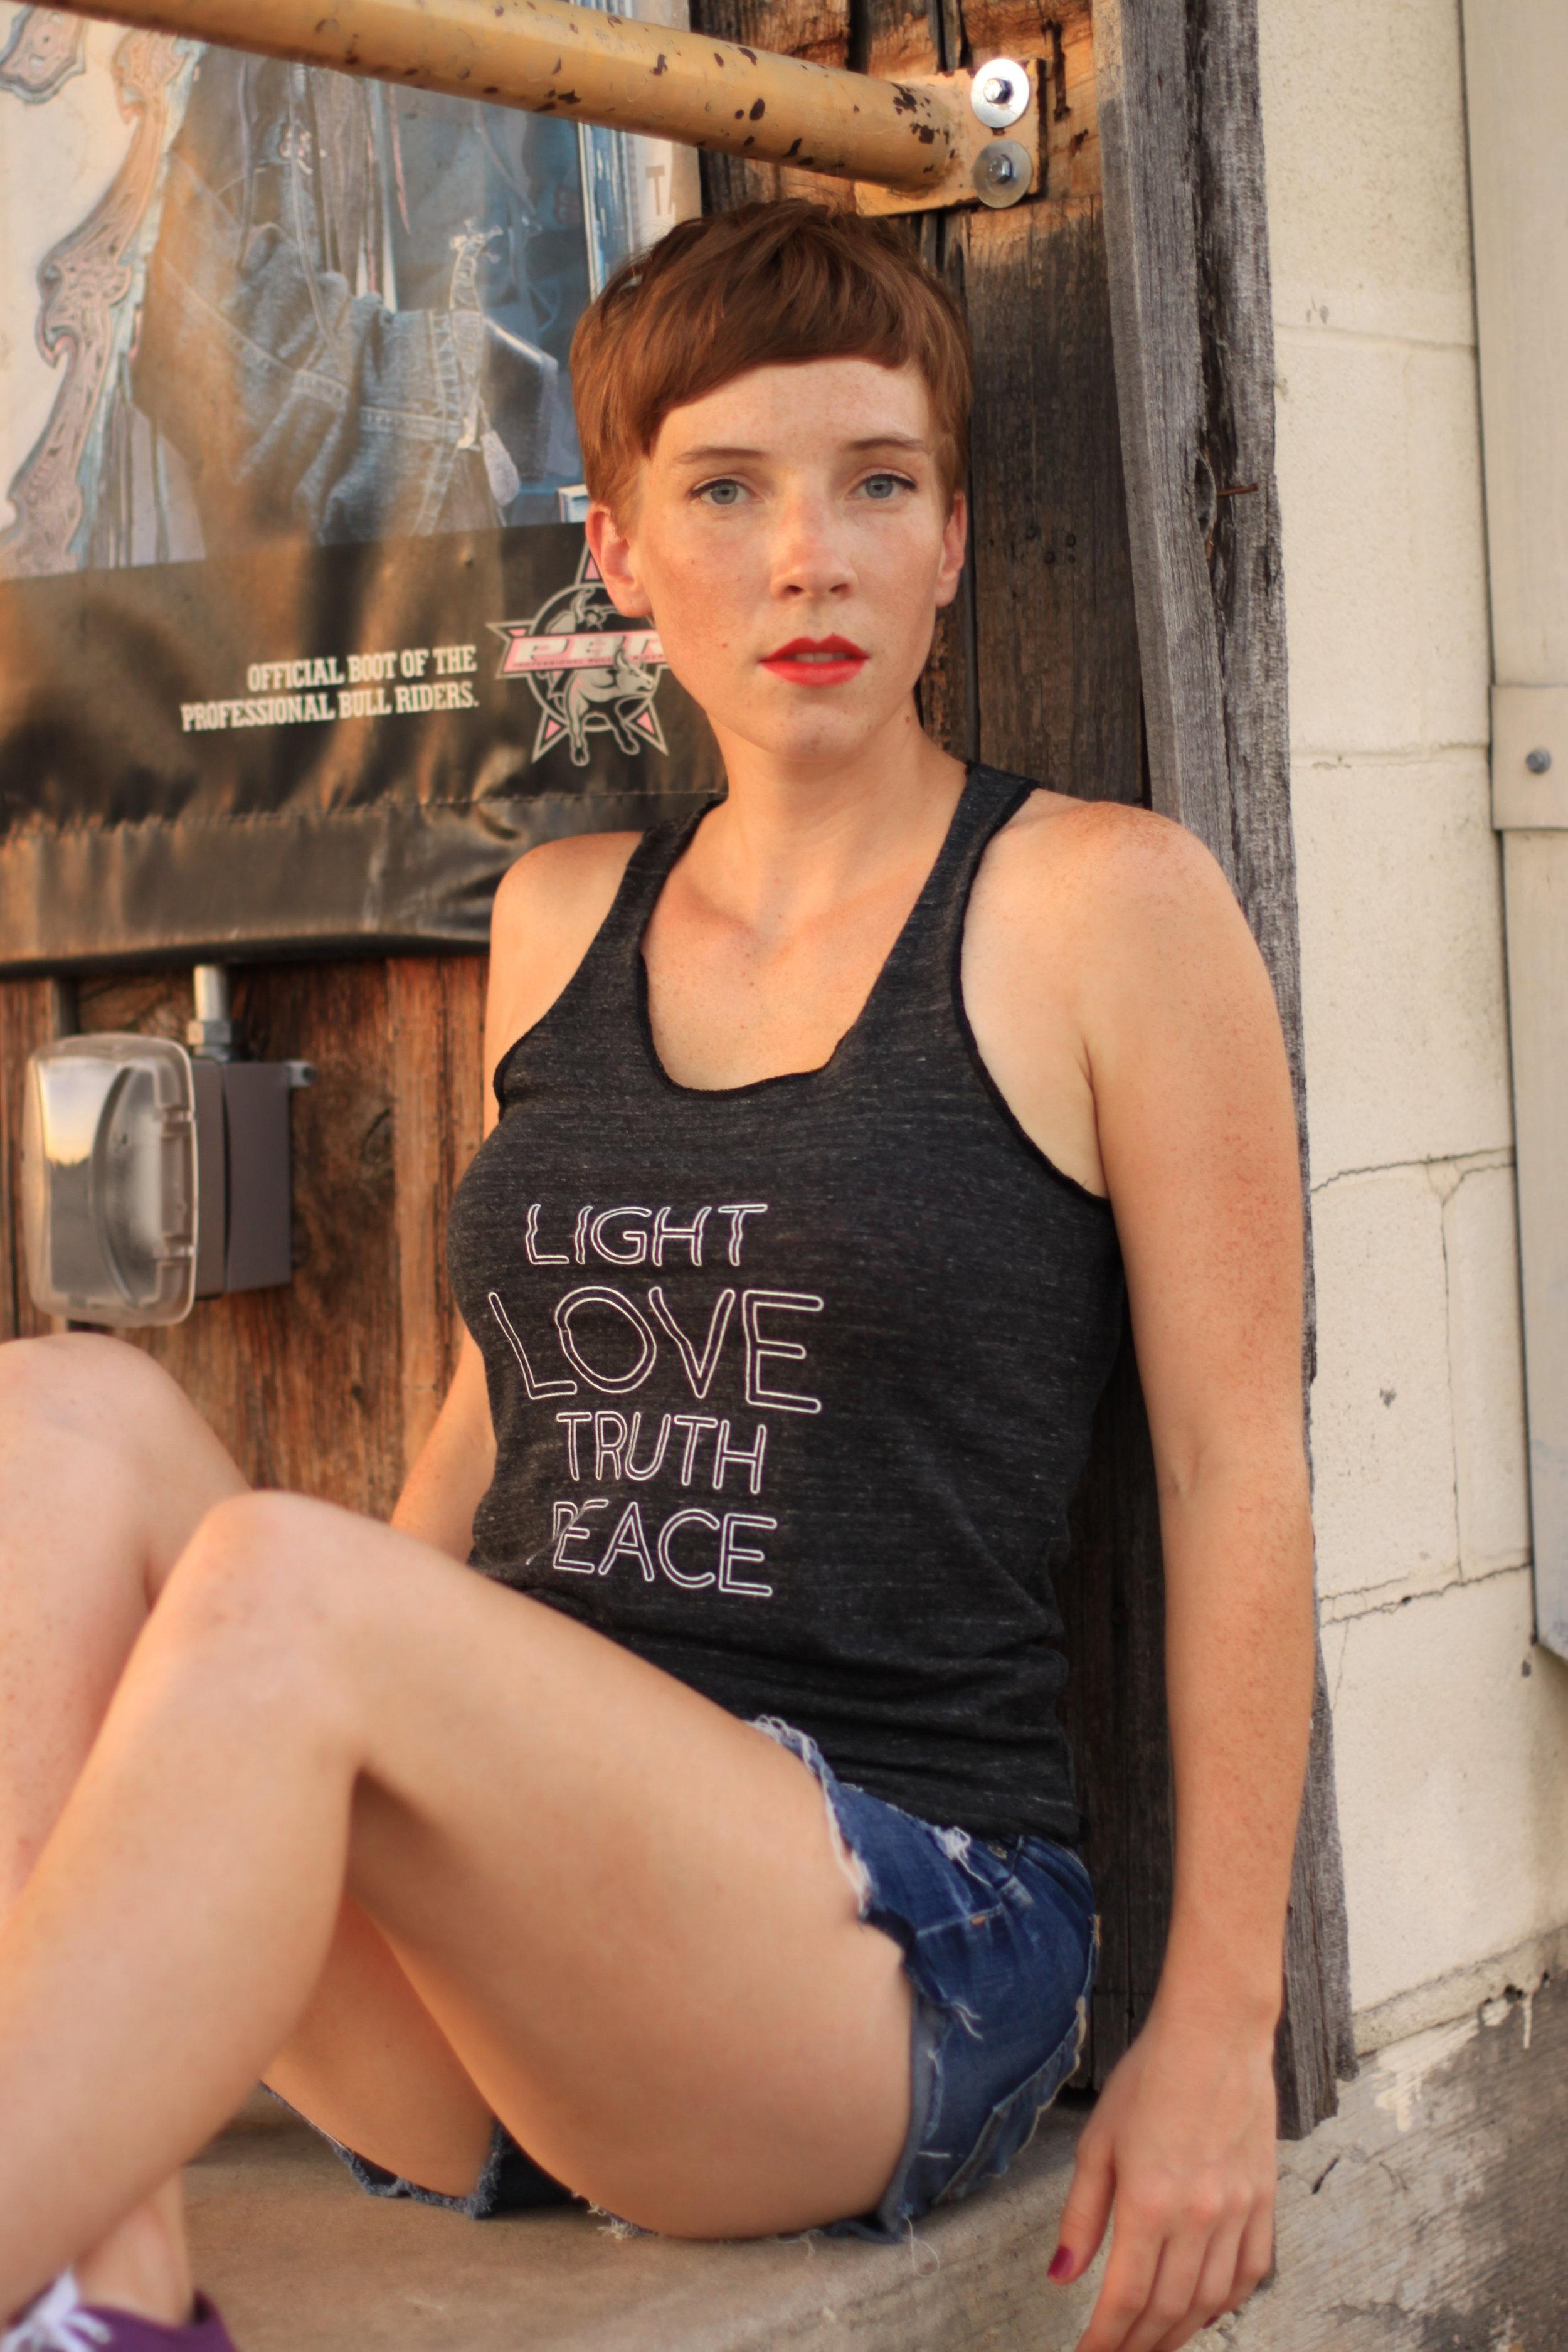 Light Love Truth Peace, East of the Sun